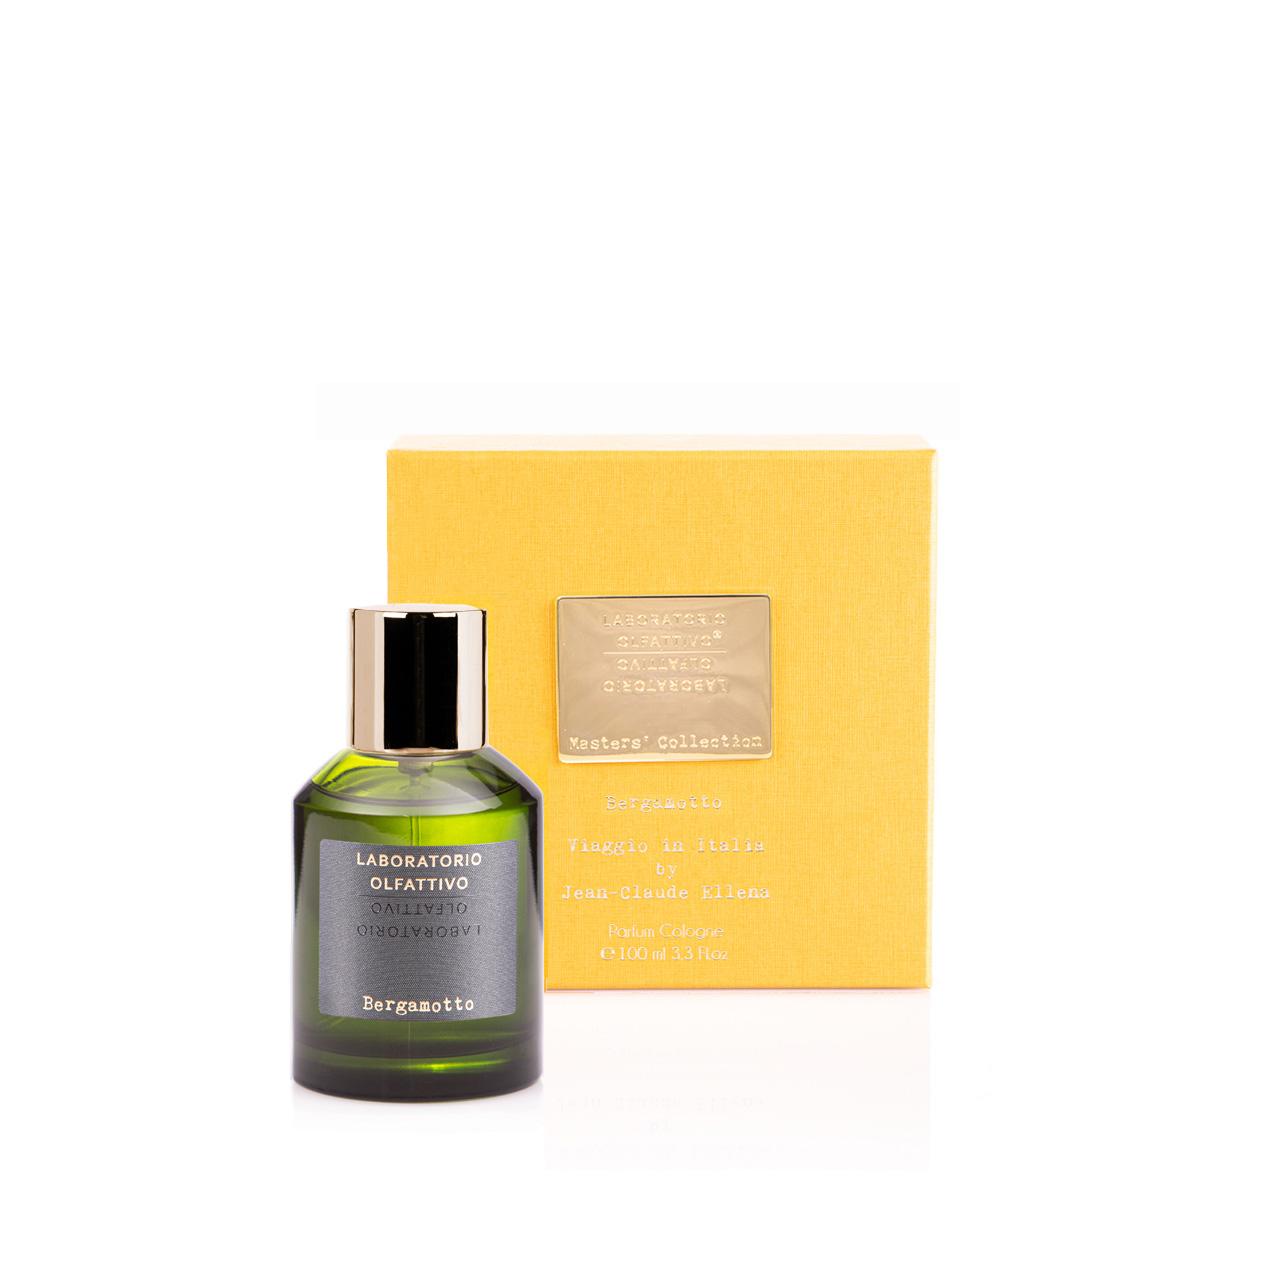 Bergamotto - Eau de Parfum